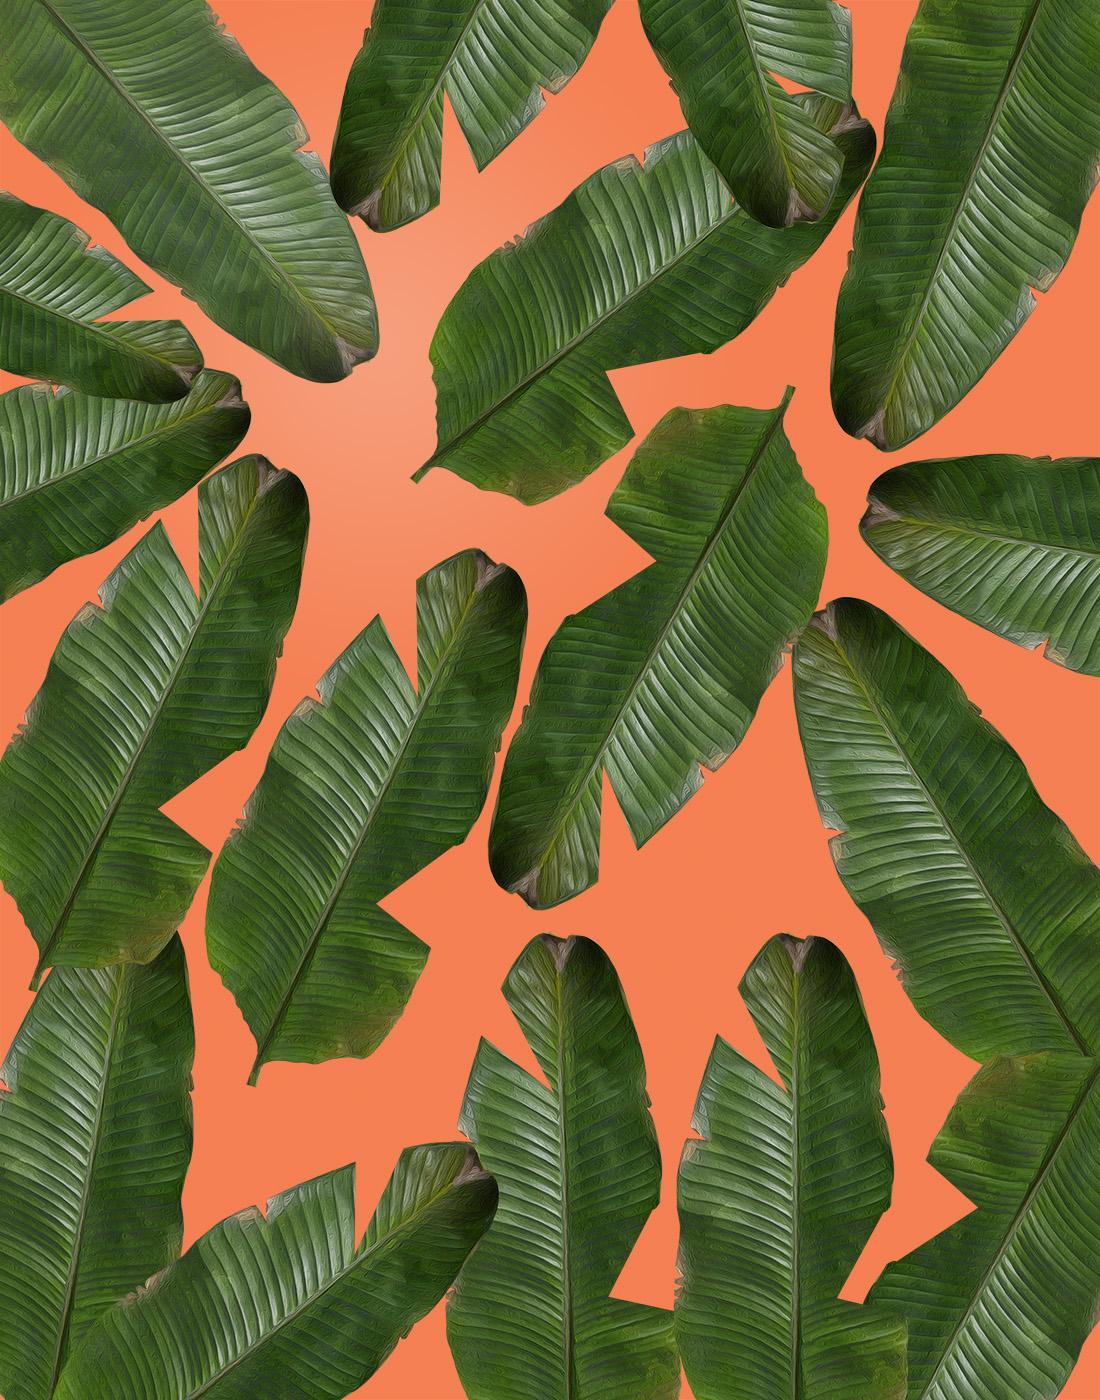 Banana Leaf Wallpaper Pattern Banana leaf print for sale 1100x1400